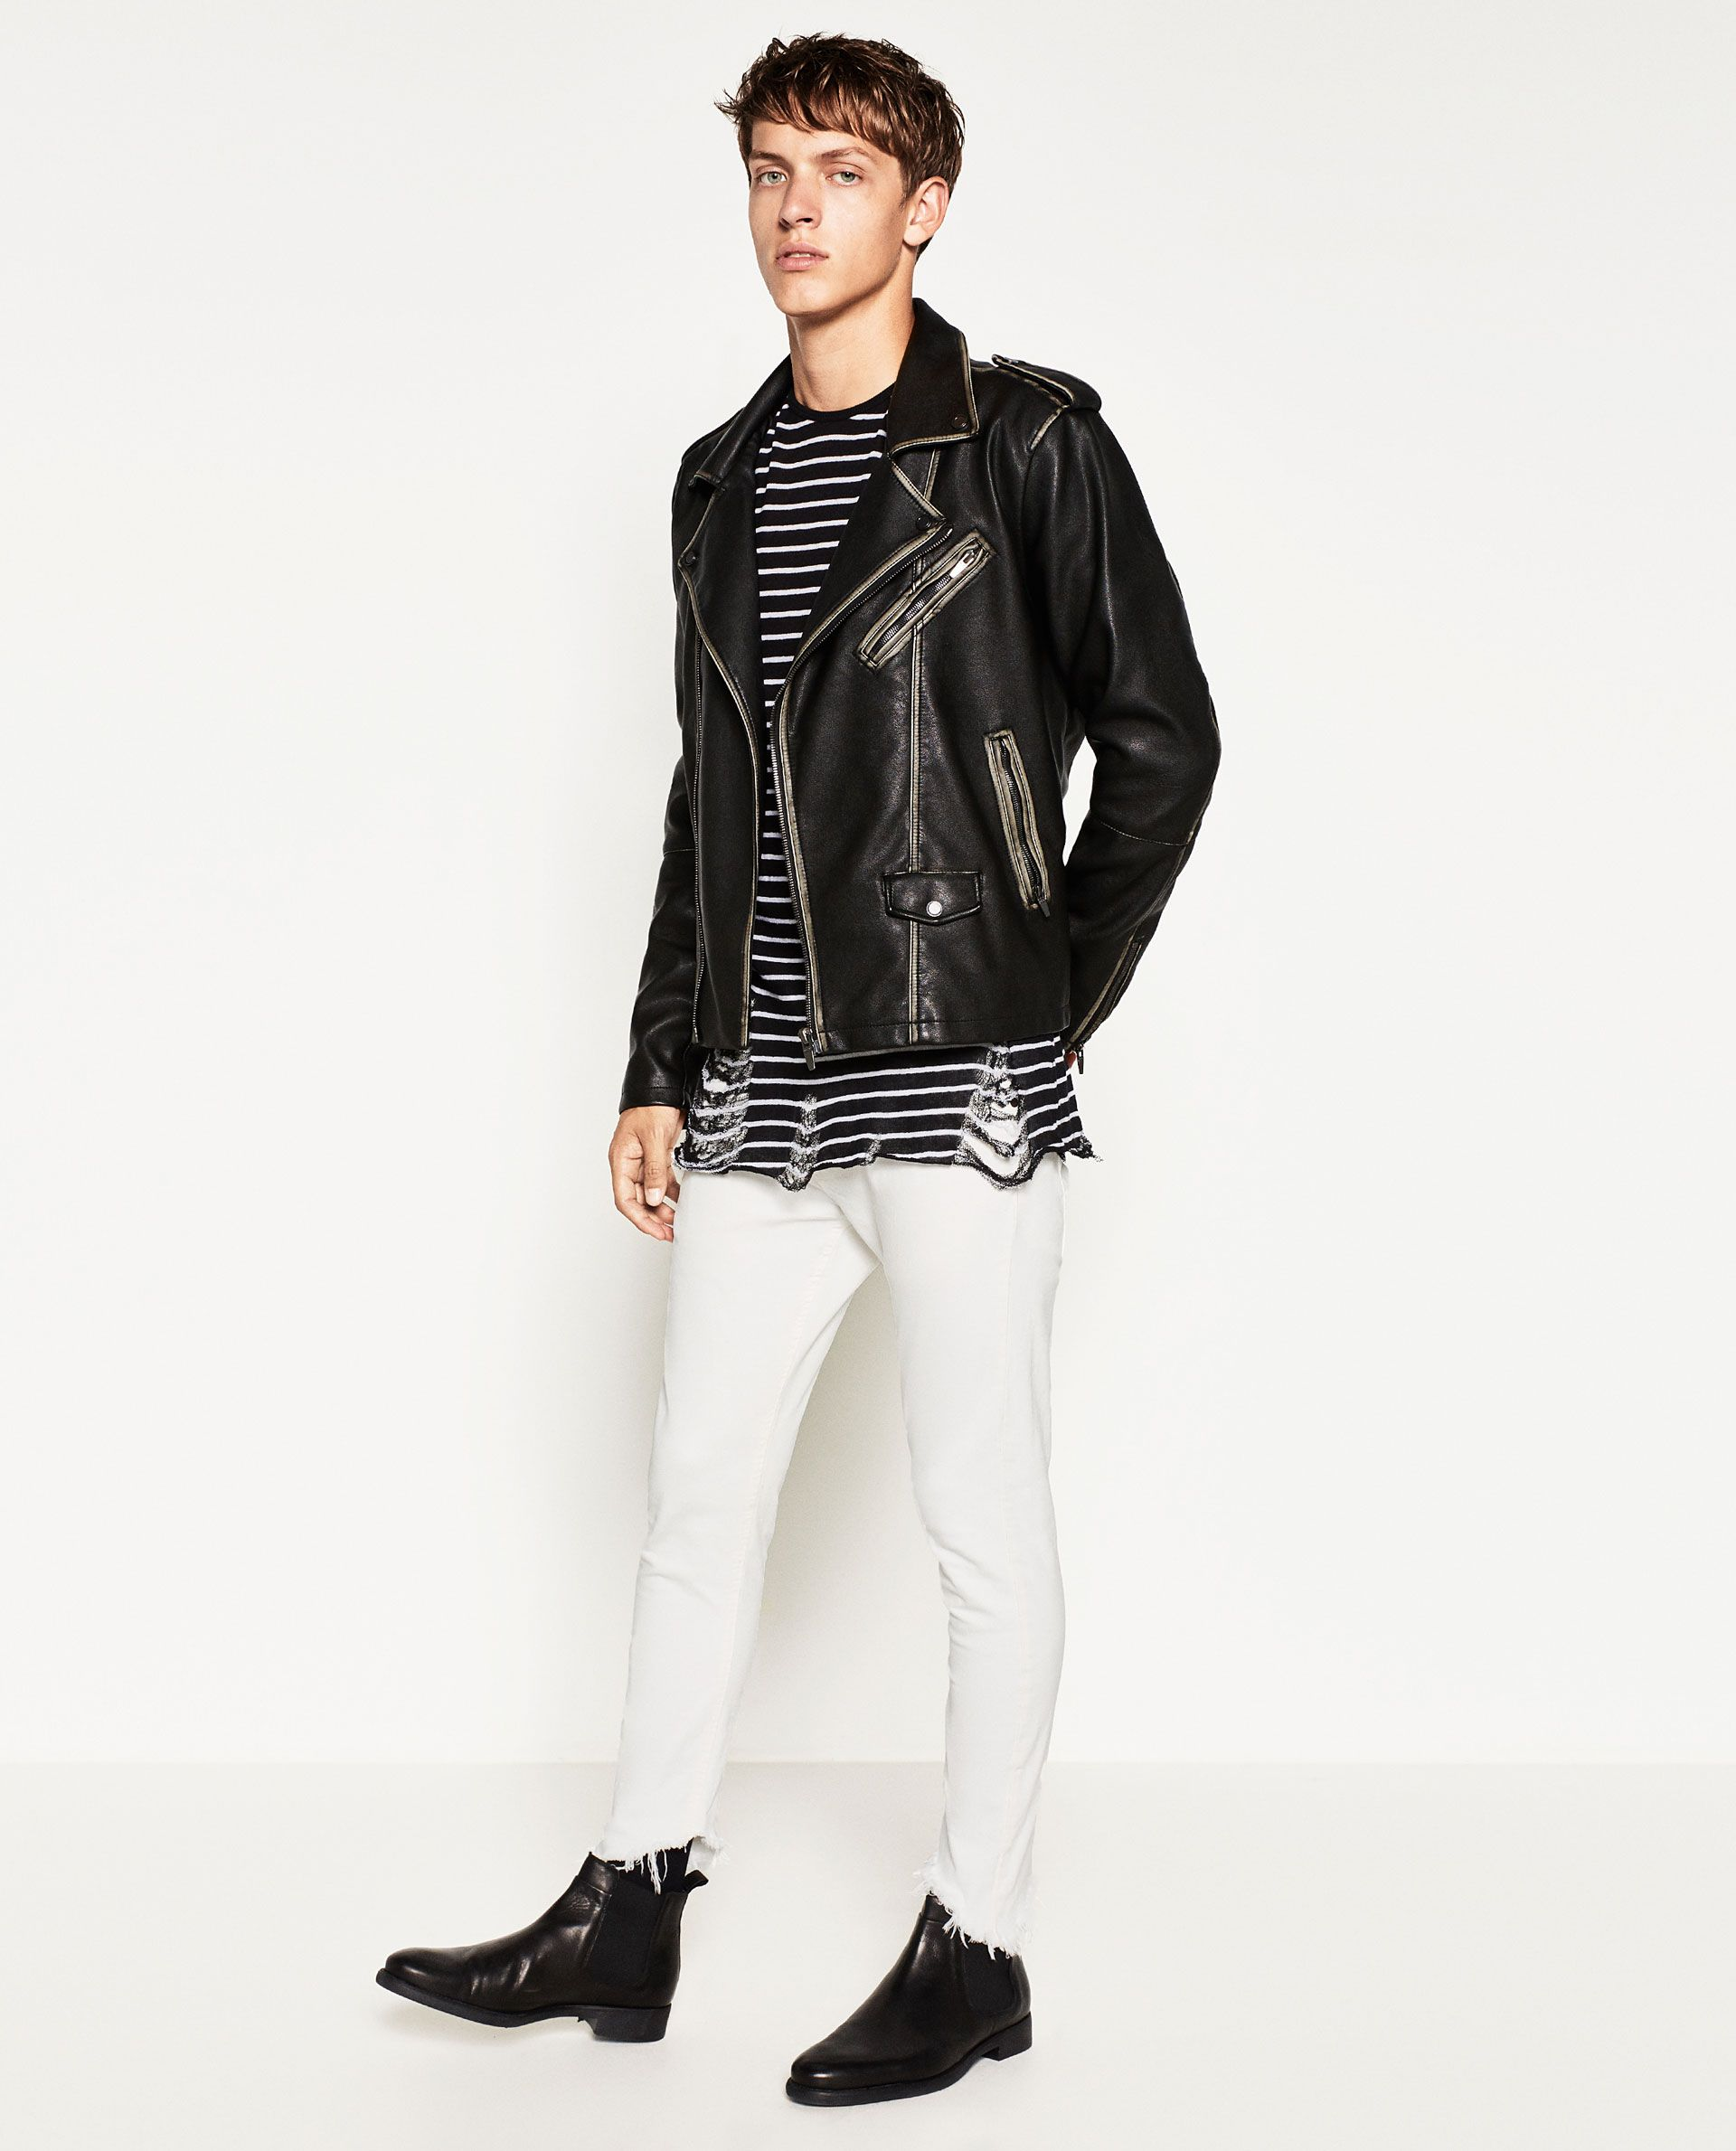 RAW EDGE TROUSERS Vintage jacket, Striped top, Menswear